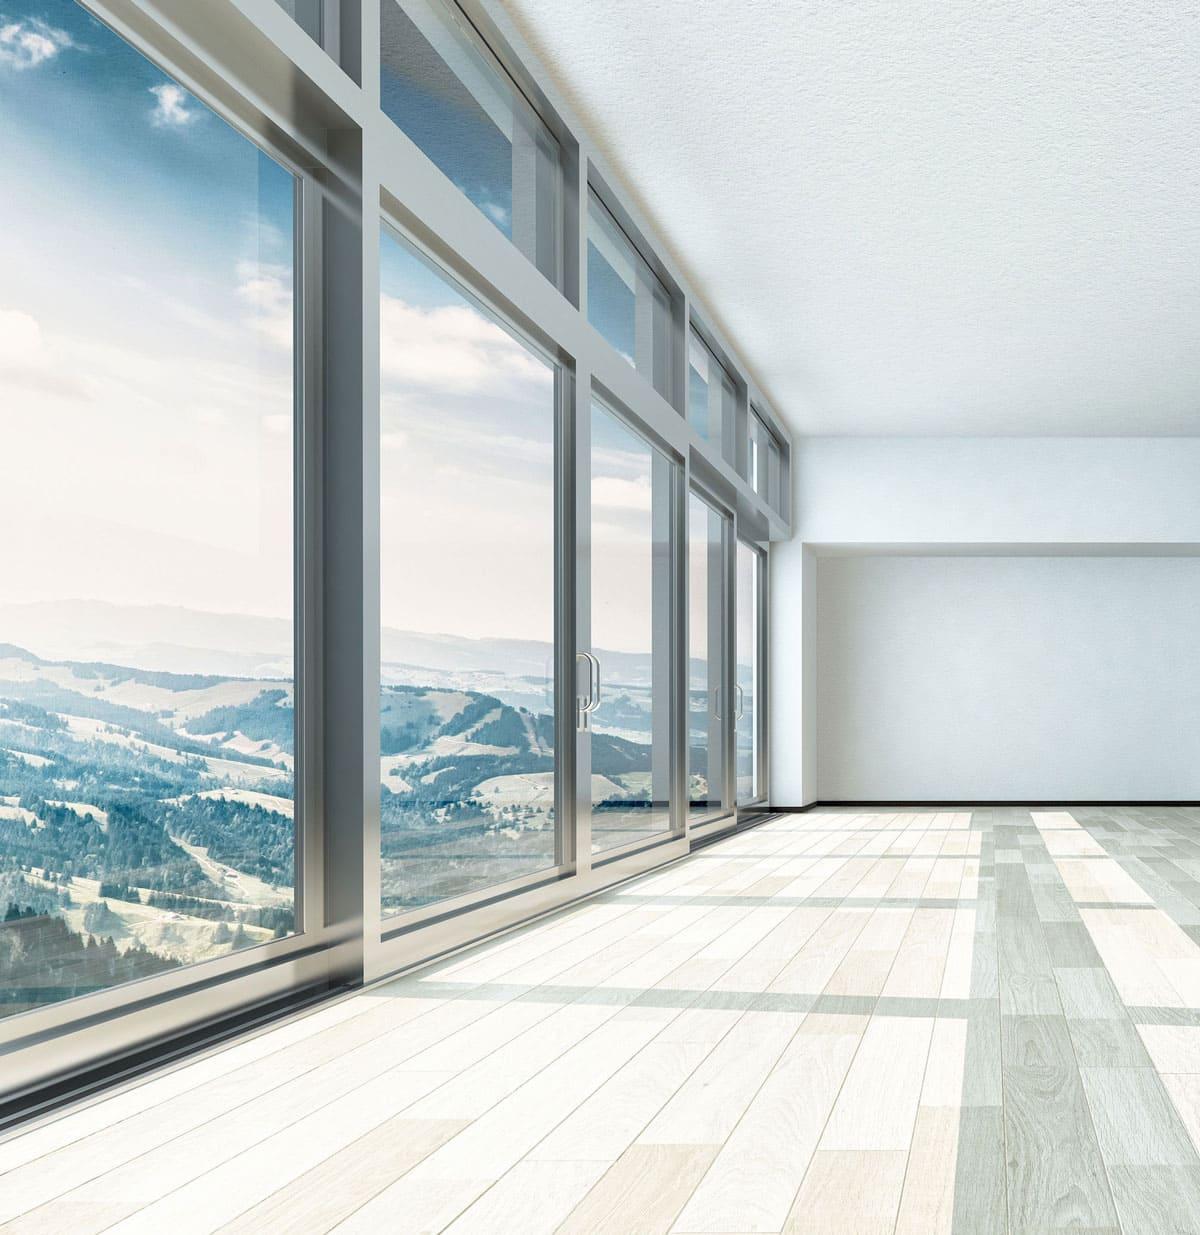 Instalación de ventanas aislantes